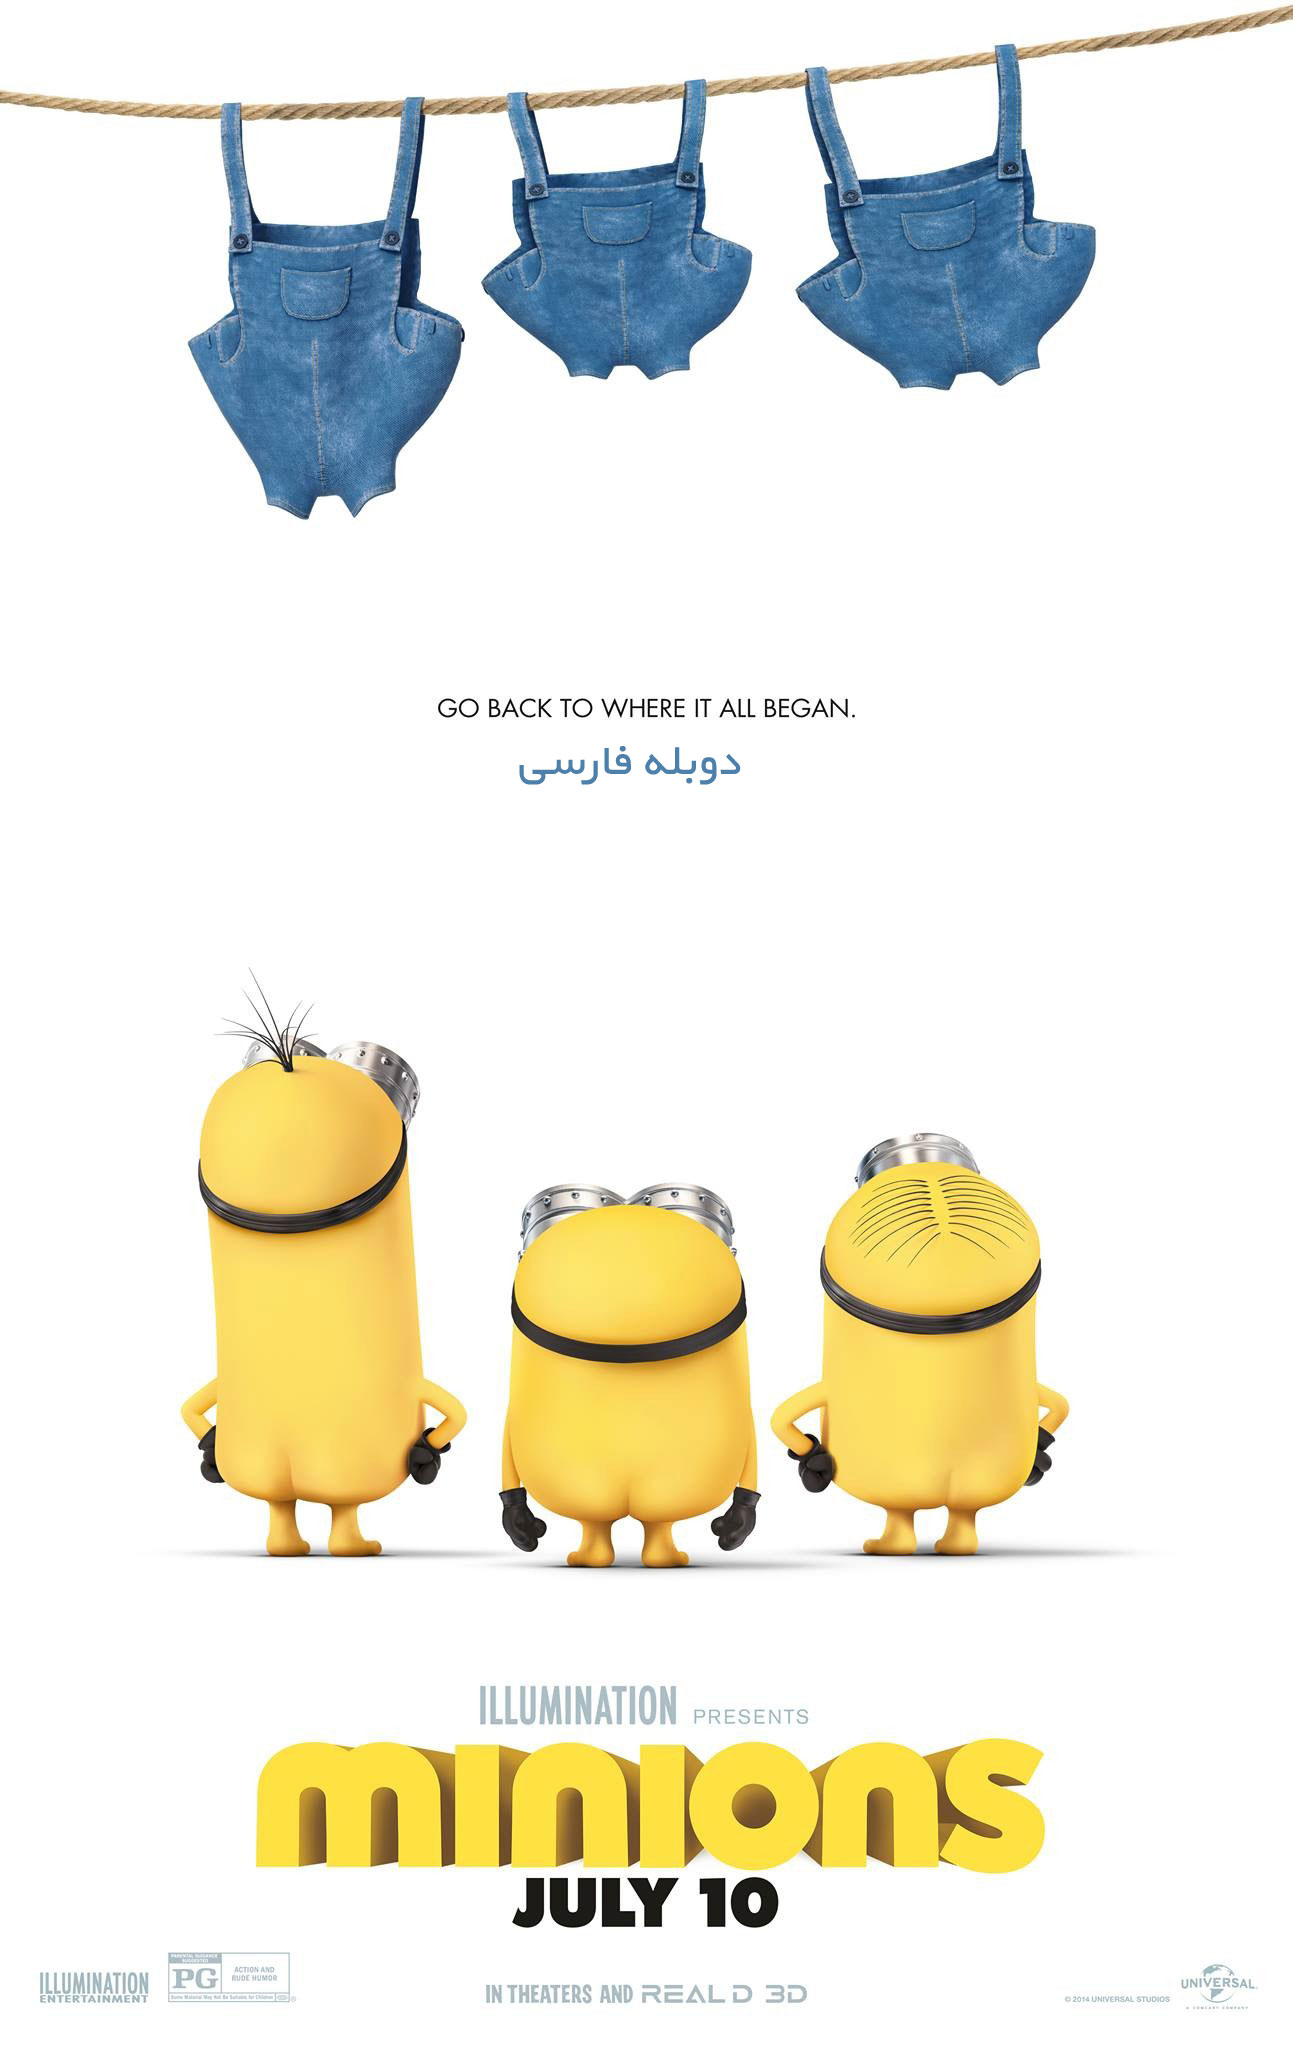 Minions - دانلود انیمیشن زیبای Minions دوبله فارسی با لینک مستقیم و همچنین به صورت مجانی و رایگان